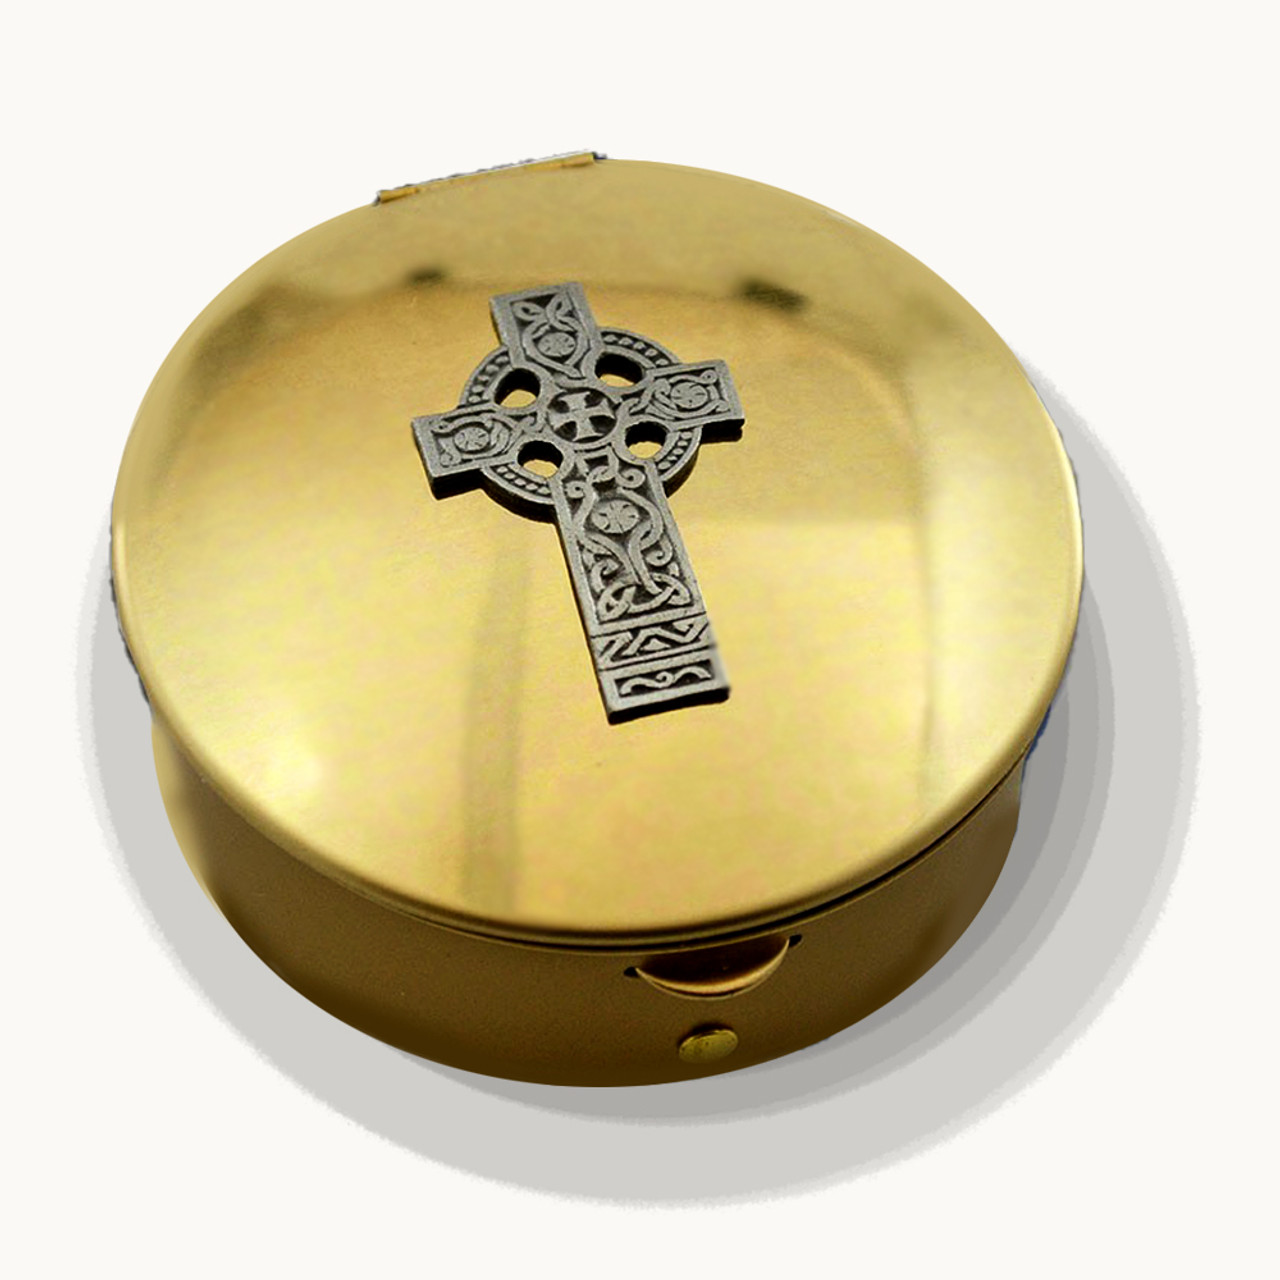 PS 144 Brass Pyx with Celtic Design